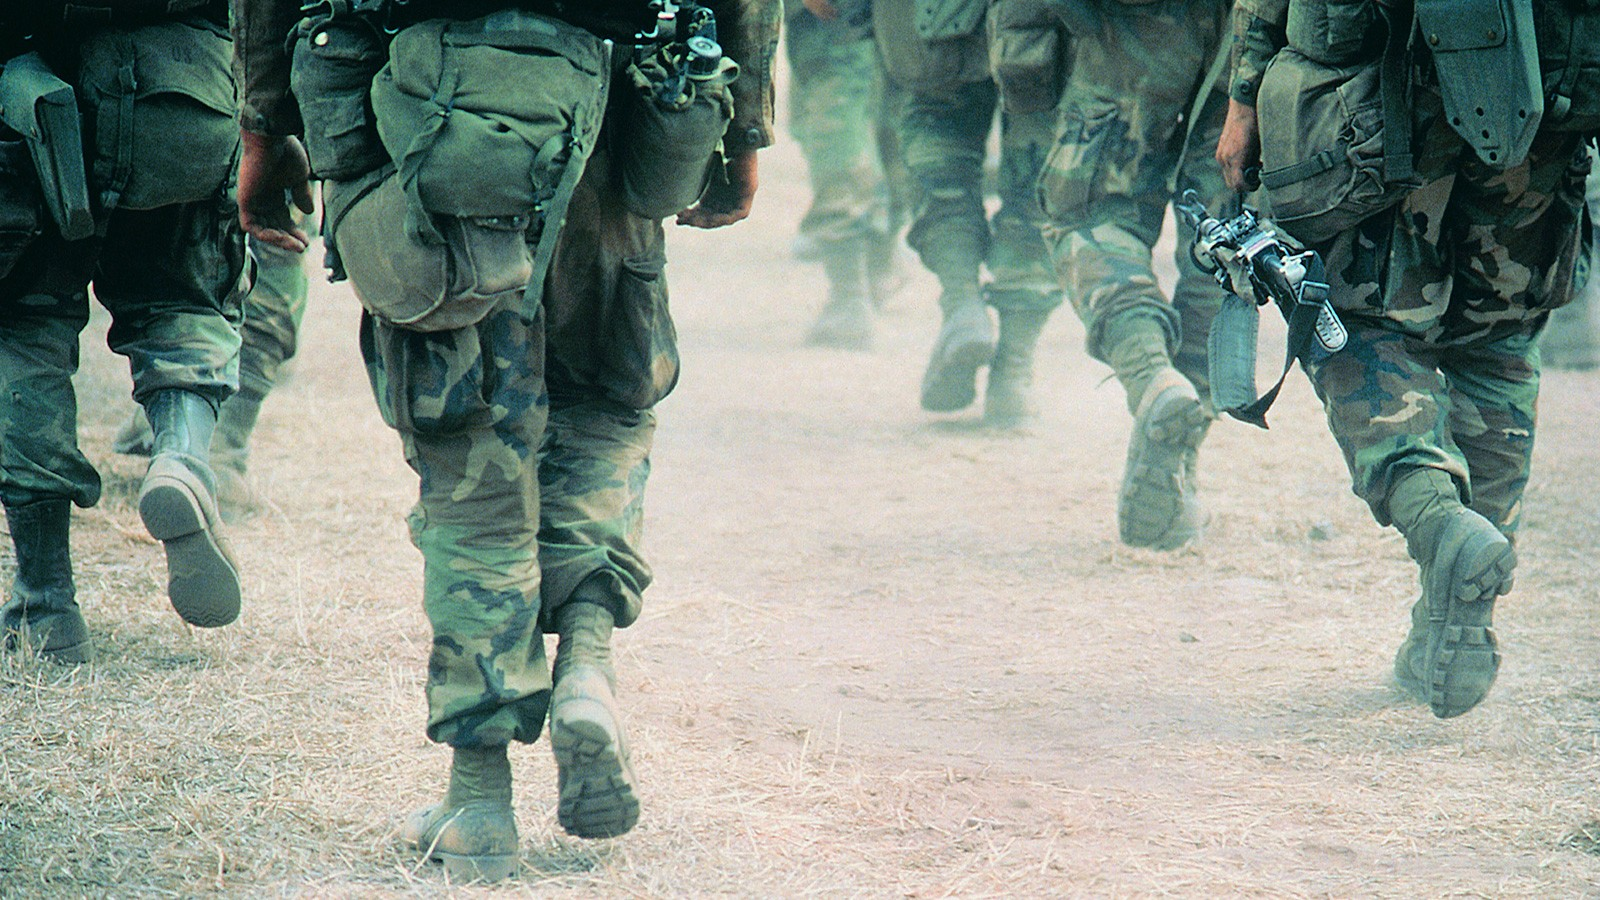 war soldiers marching in desert